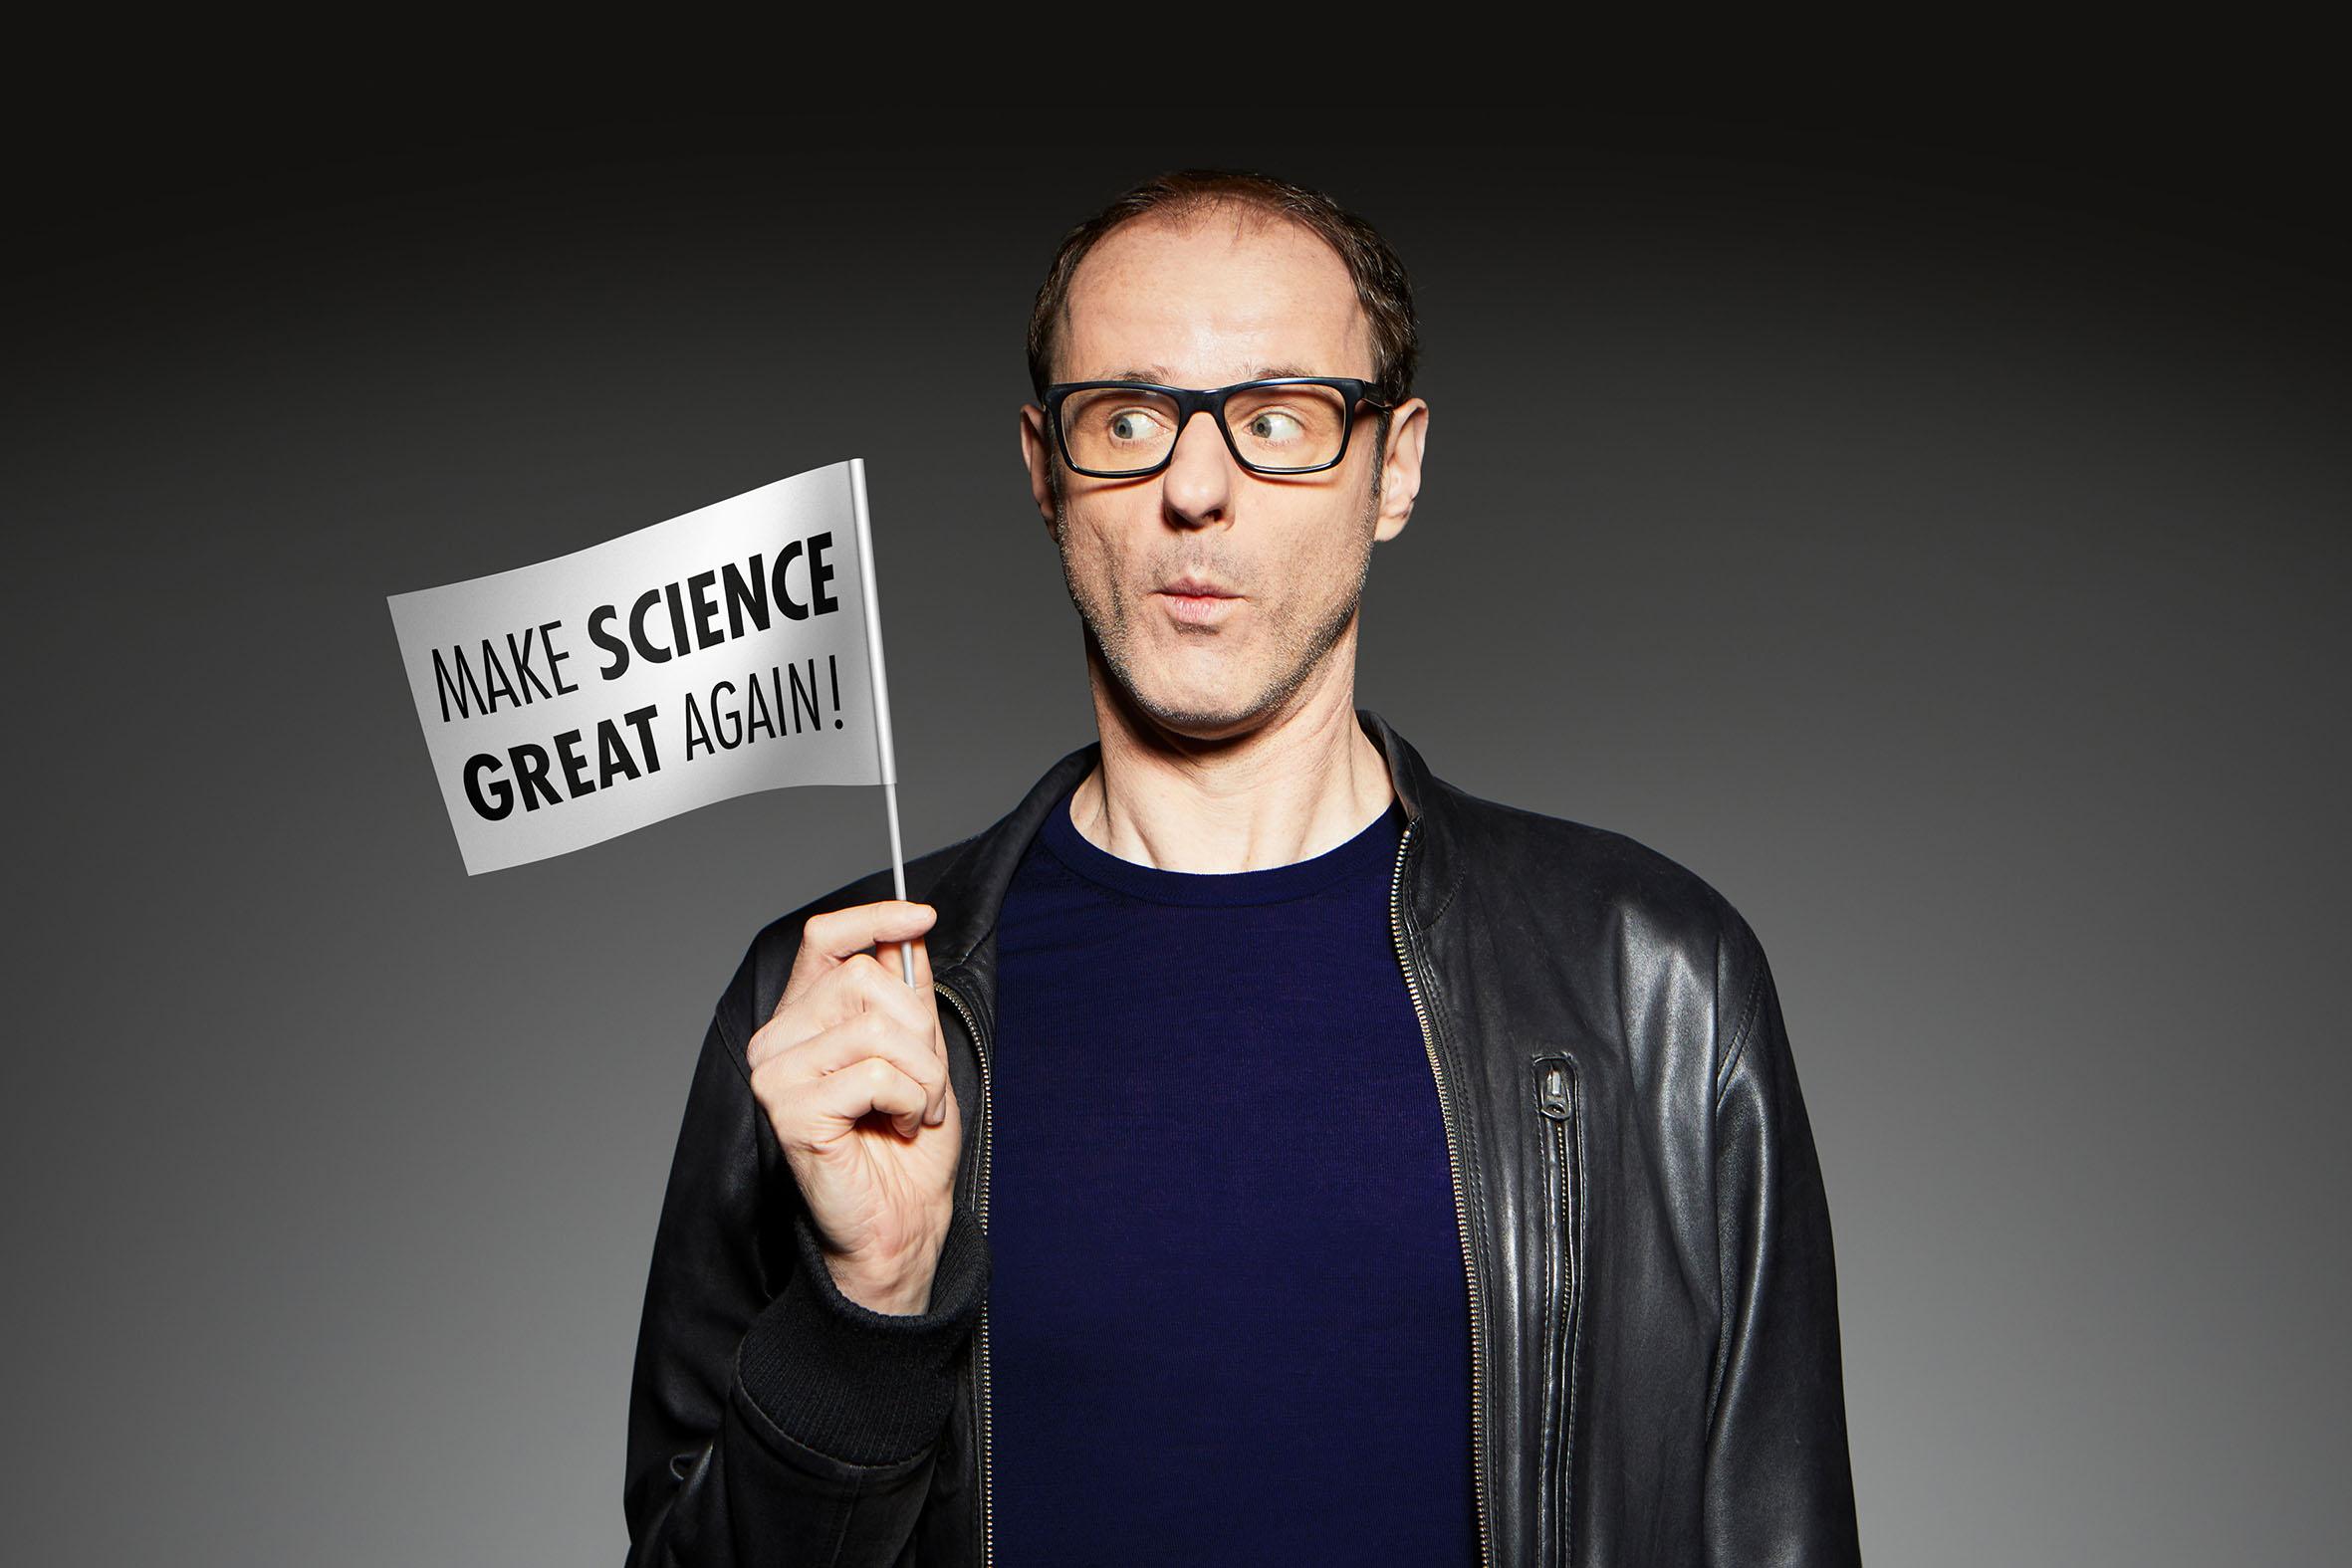 Make Science Great Again!